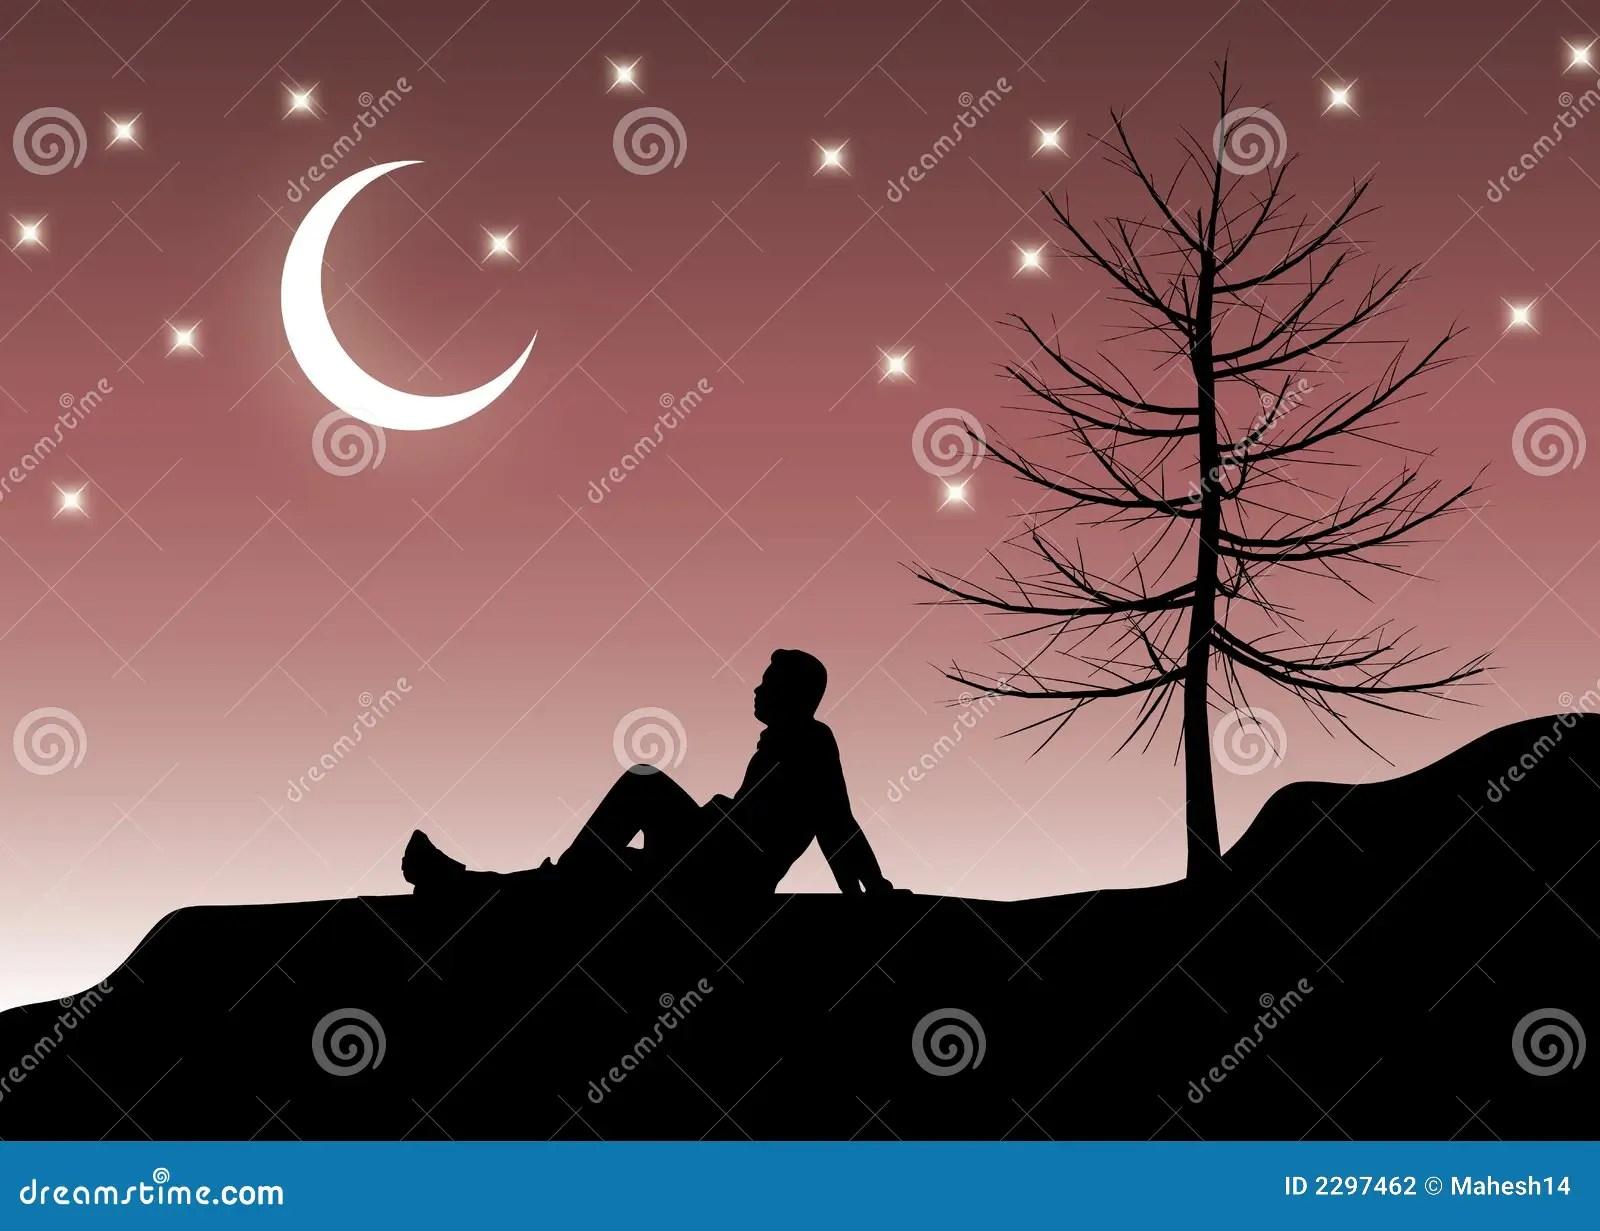 Sitting Alone at night stock illustration. Illustration of ...